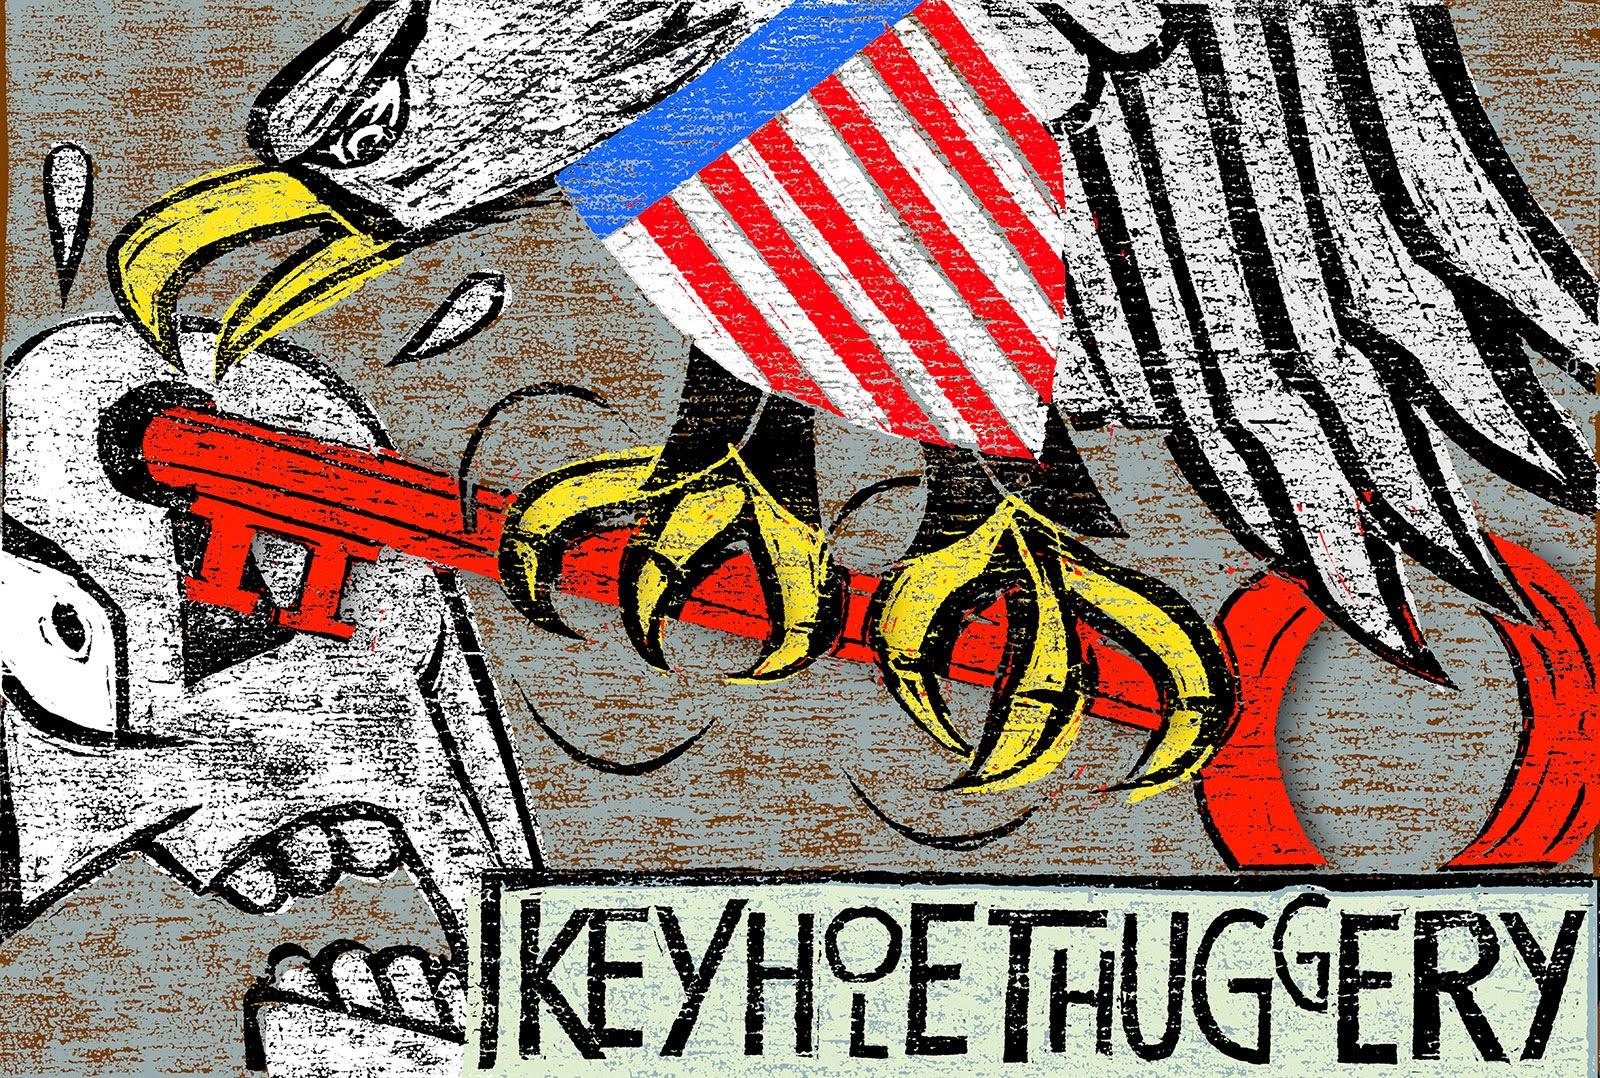 Daniel Pudles: Keyhole Thuggery.